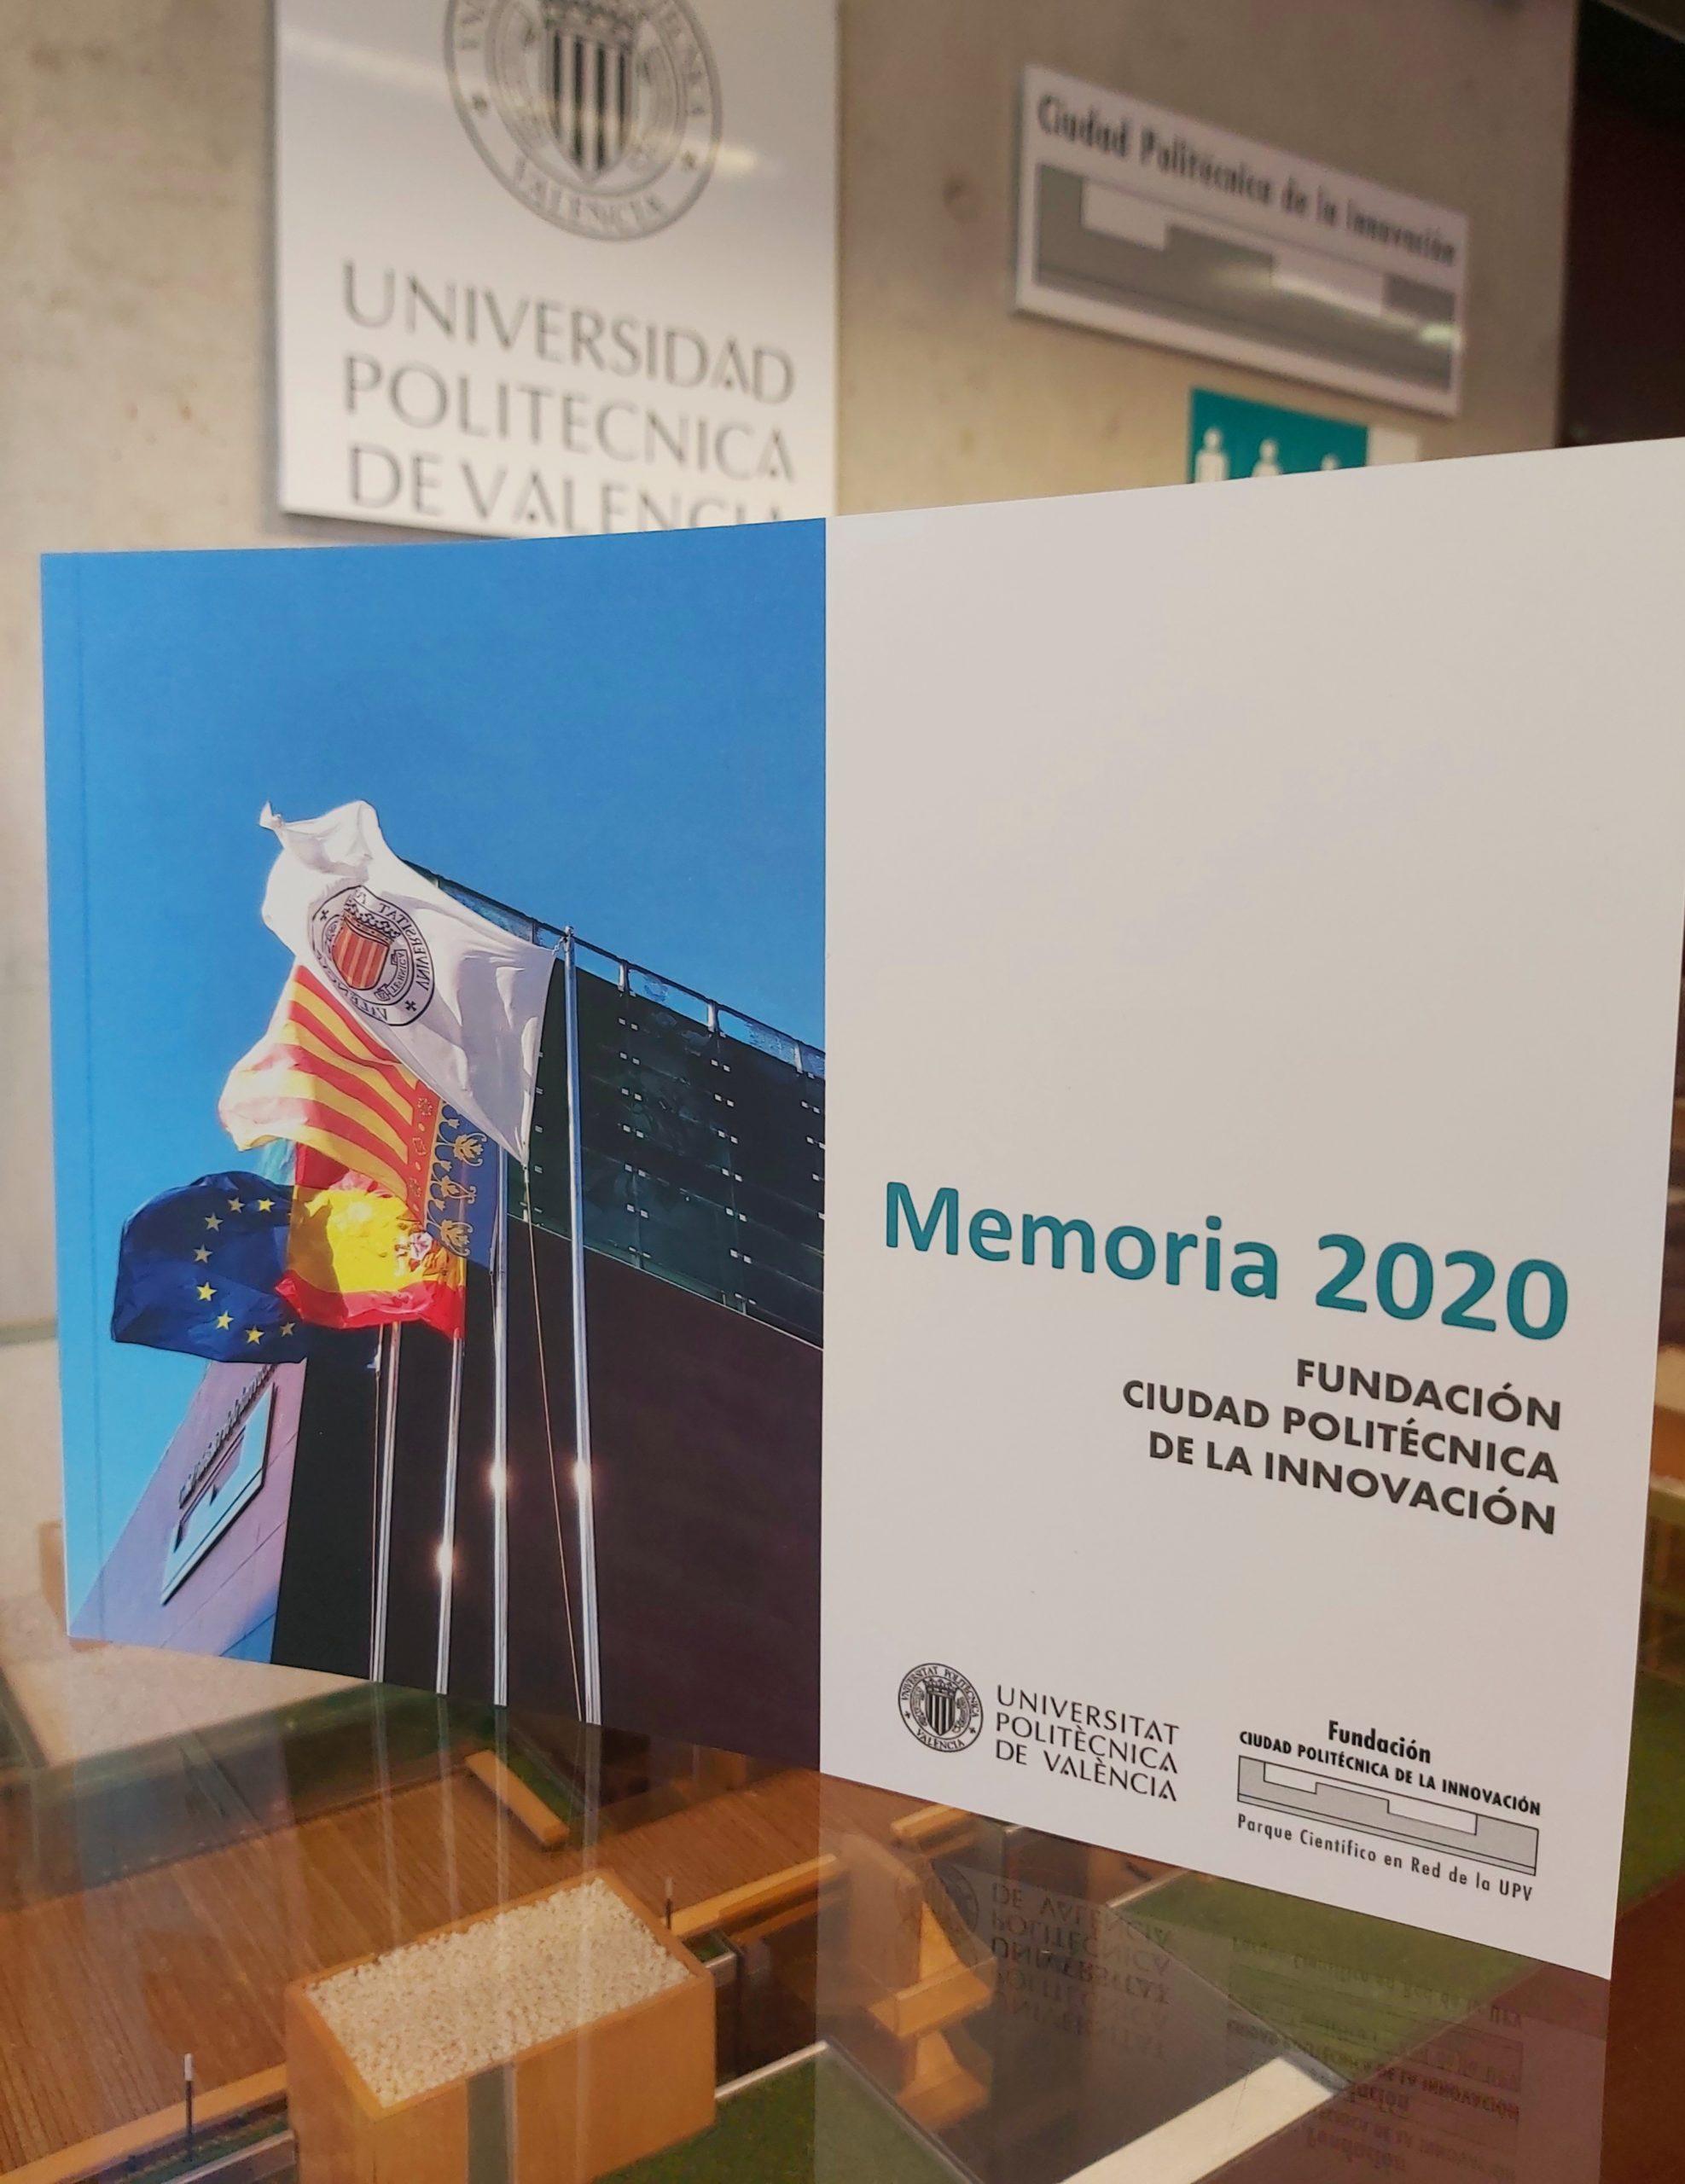 memoria cpi 2020